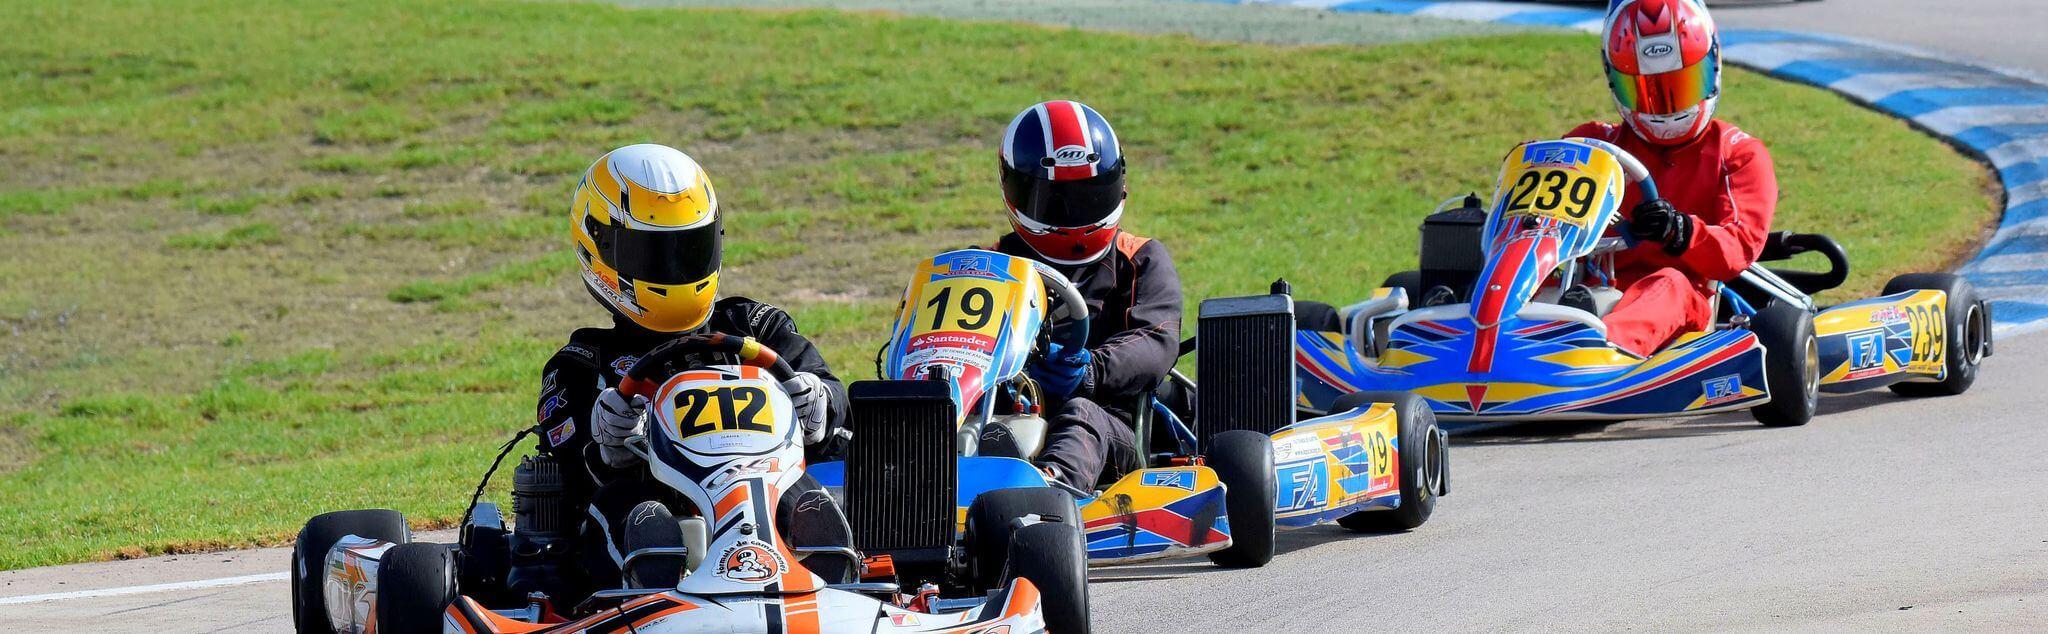 Karting dans Mirecourt